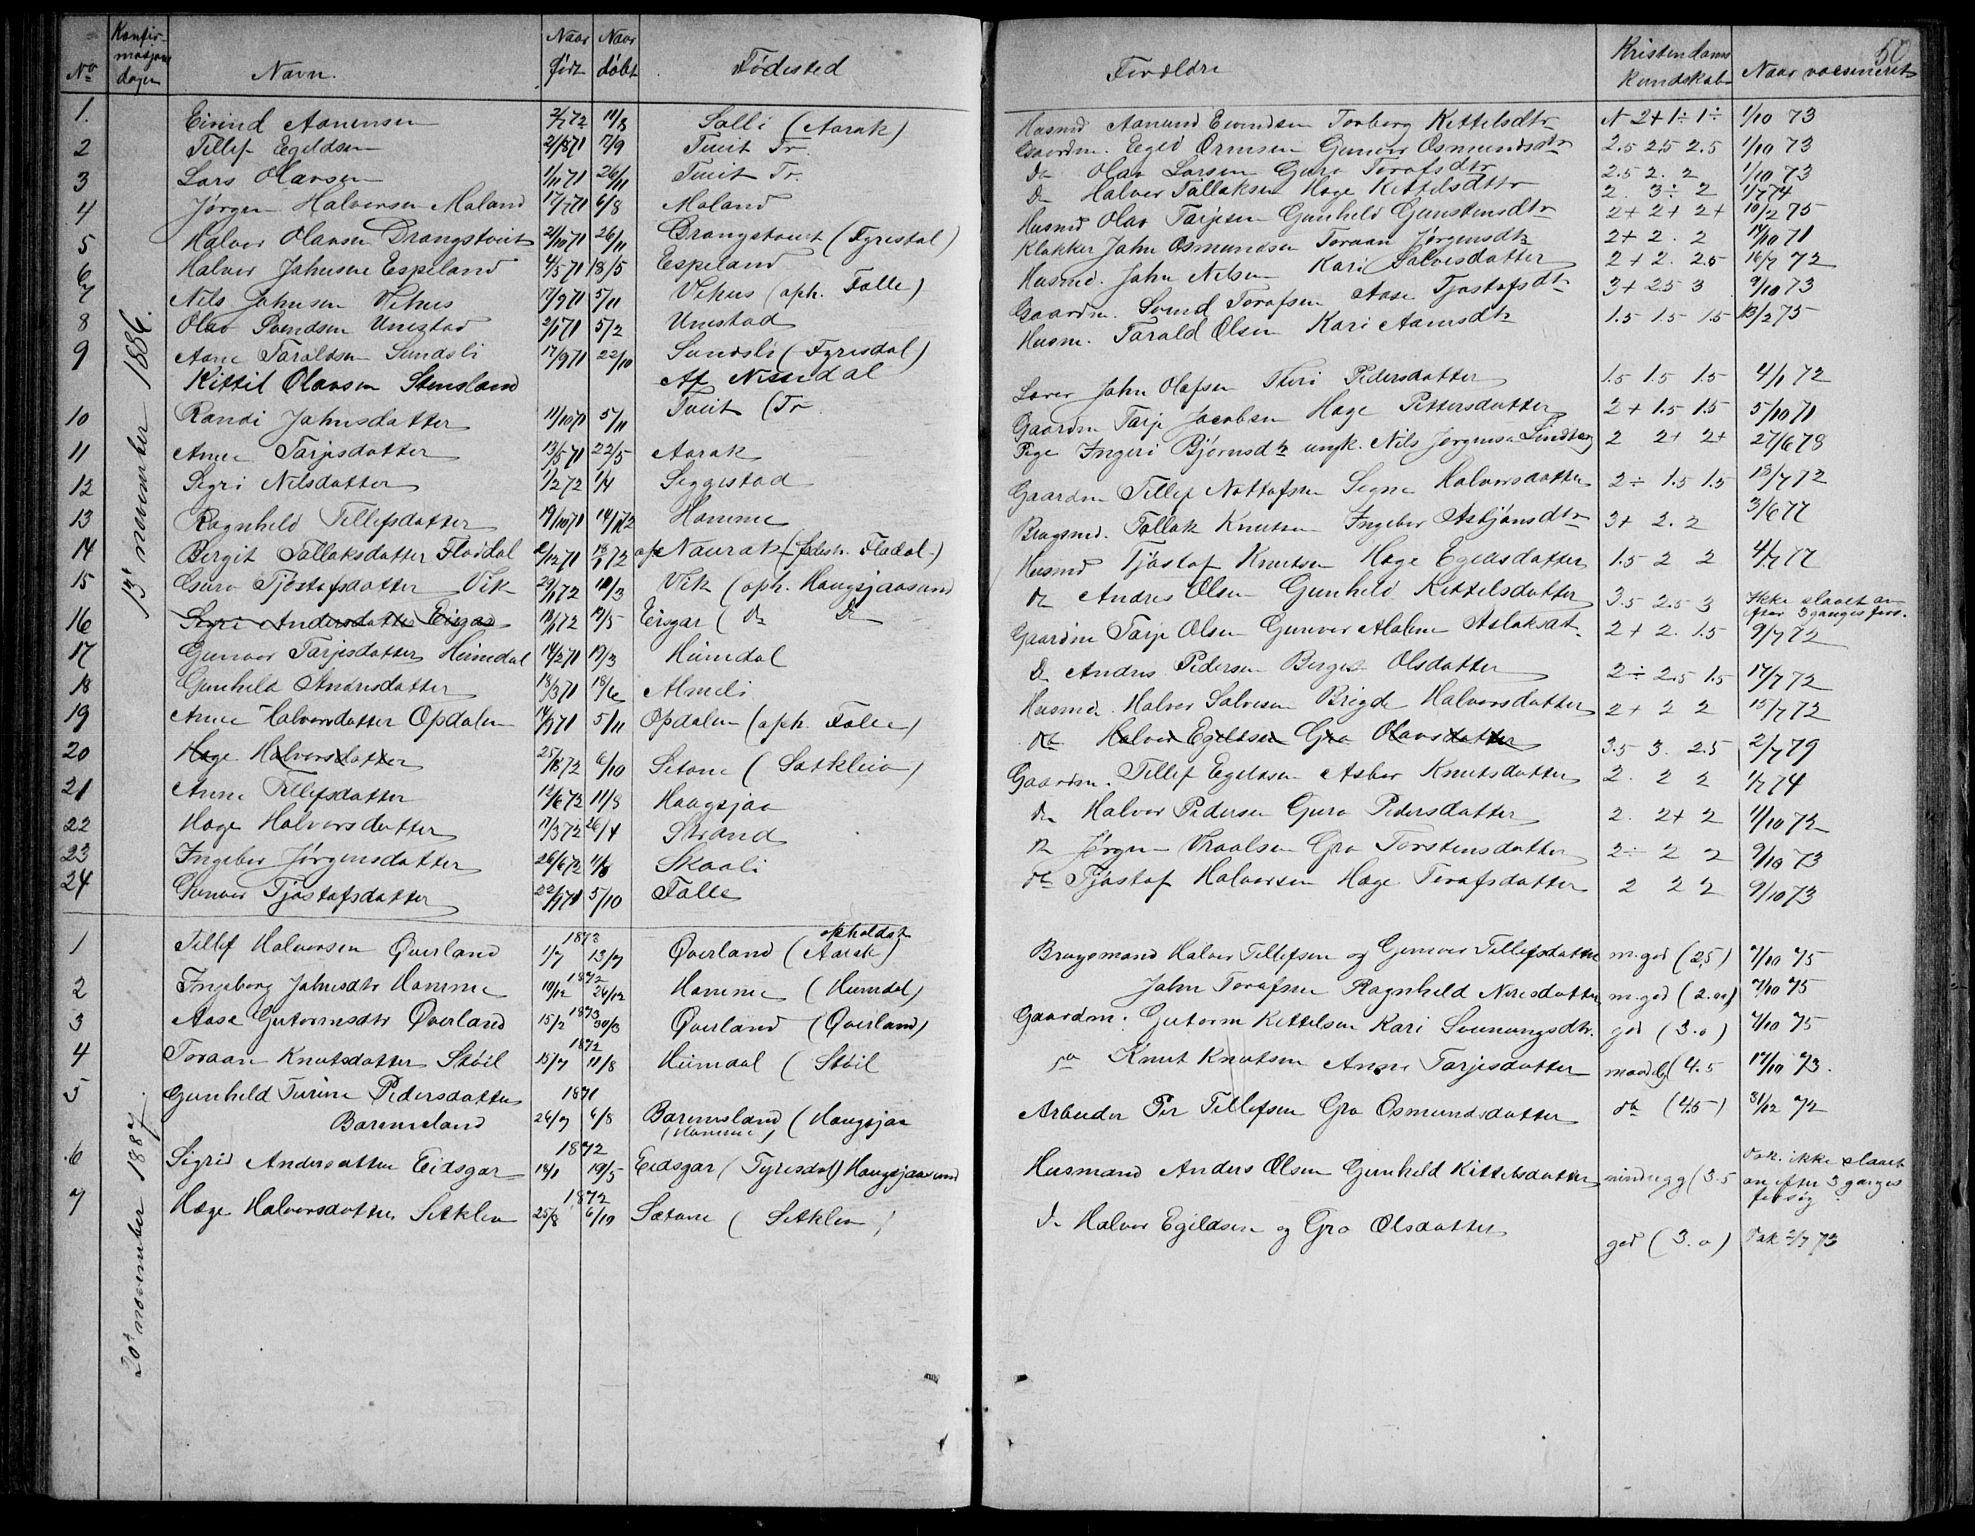 SAKO, Nissedal kirkebøker, G/Gb/L0002: Klokkerbok nr. II 2, 1863-1892, s. 50